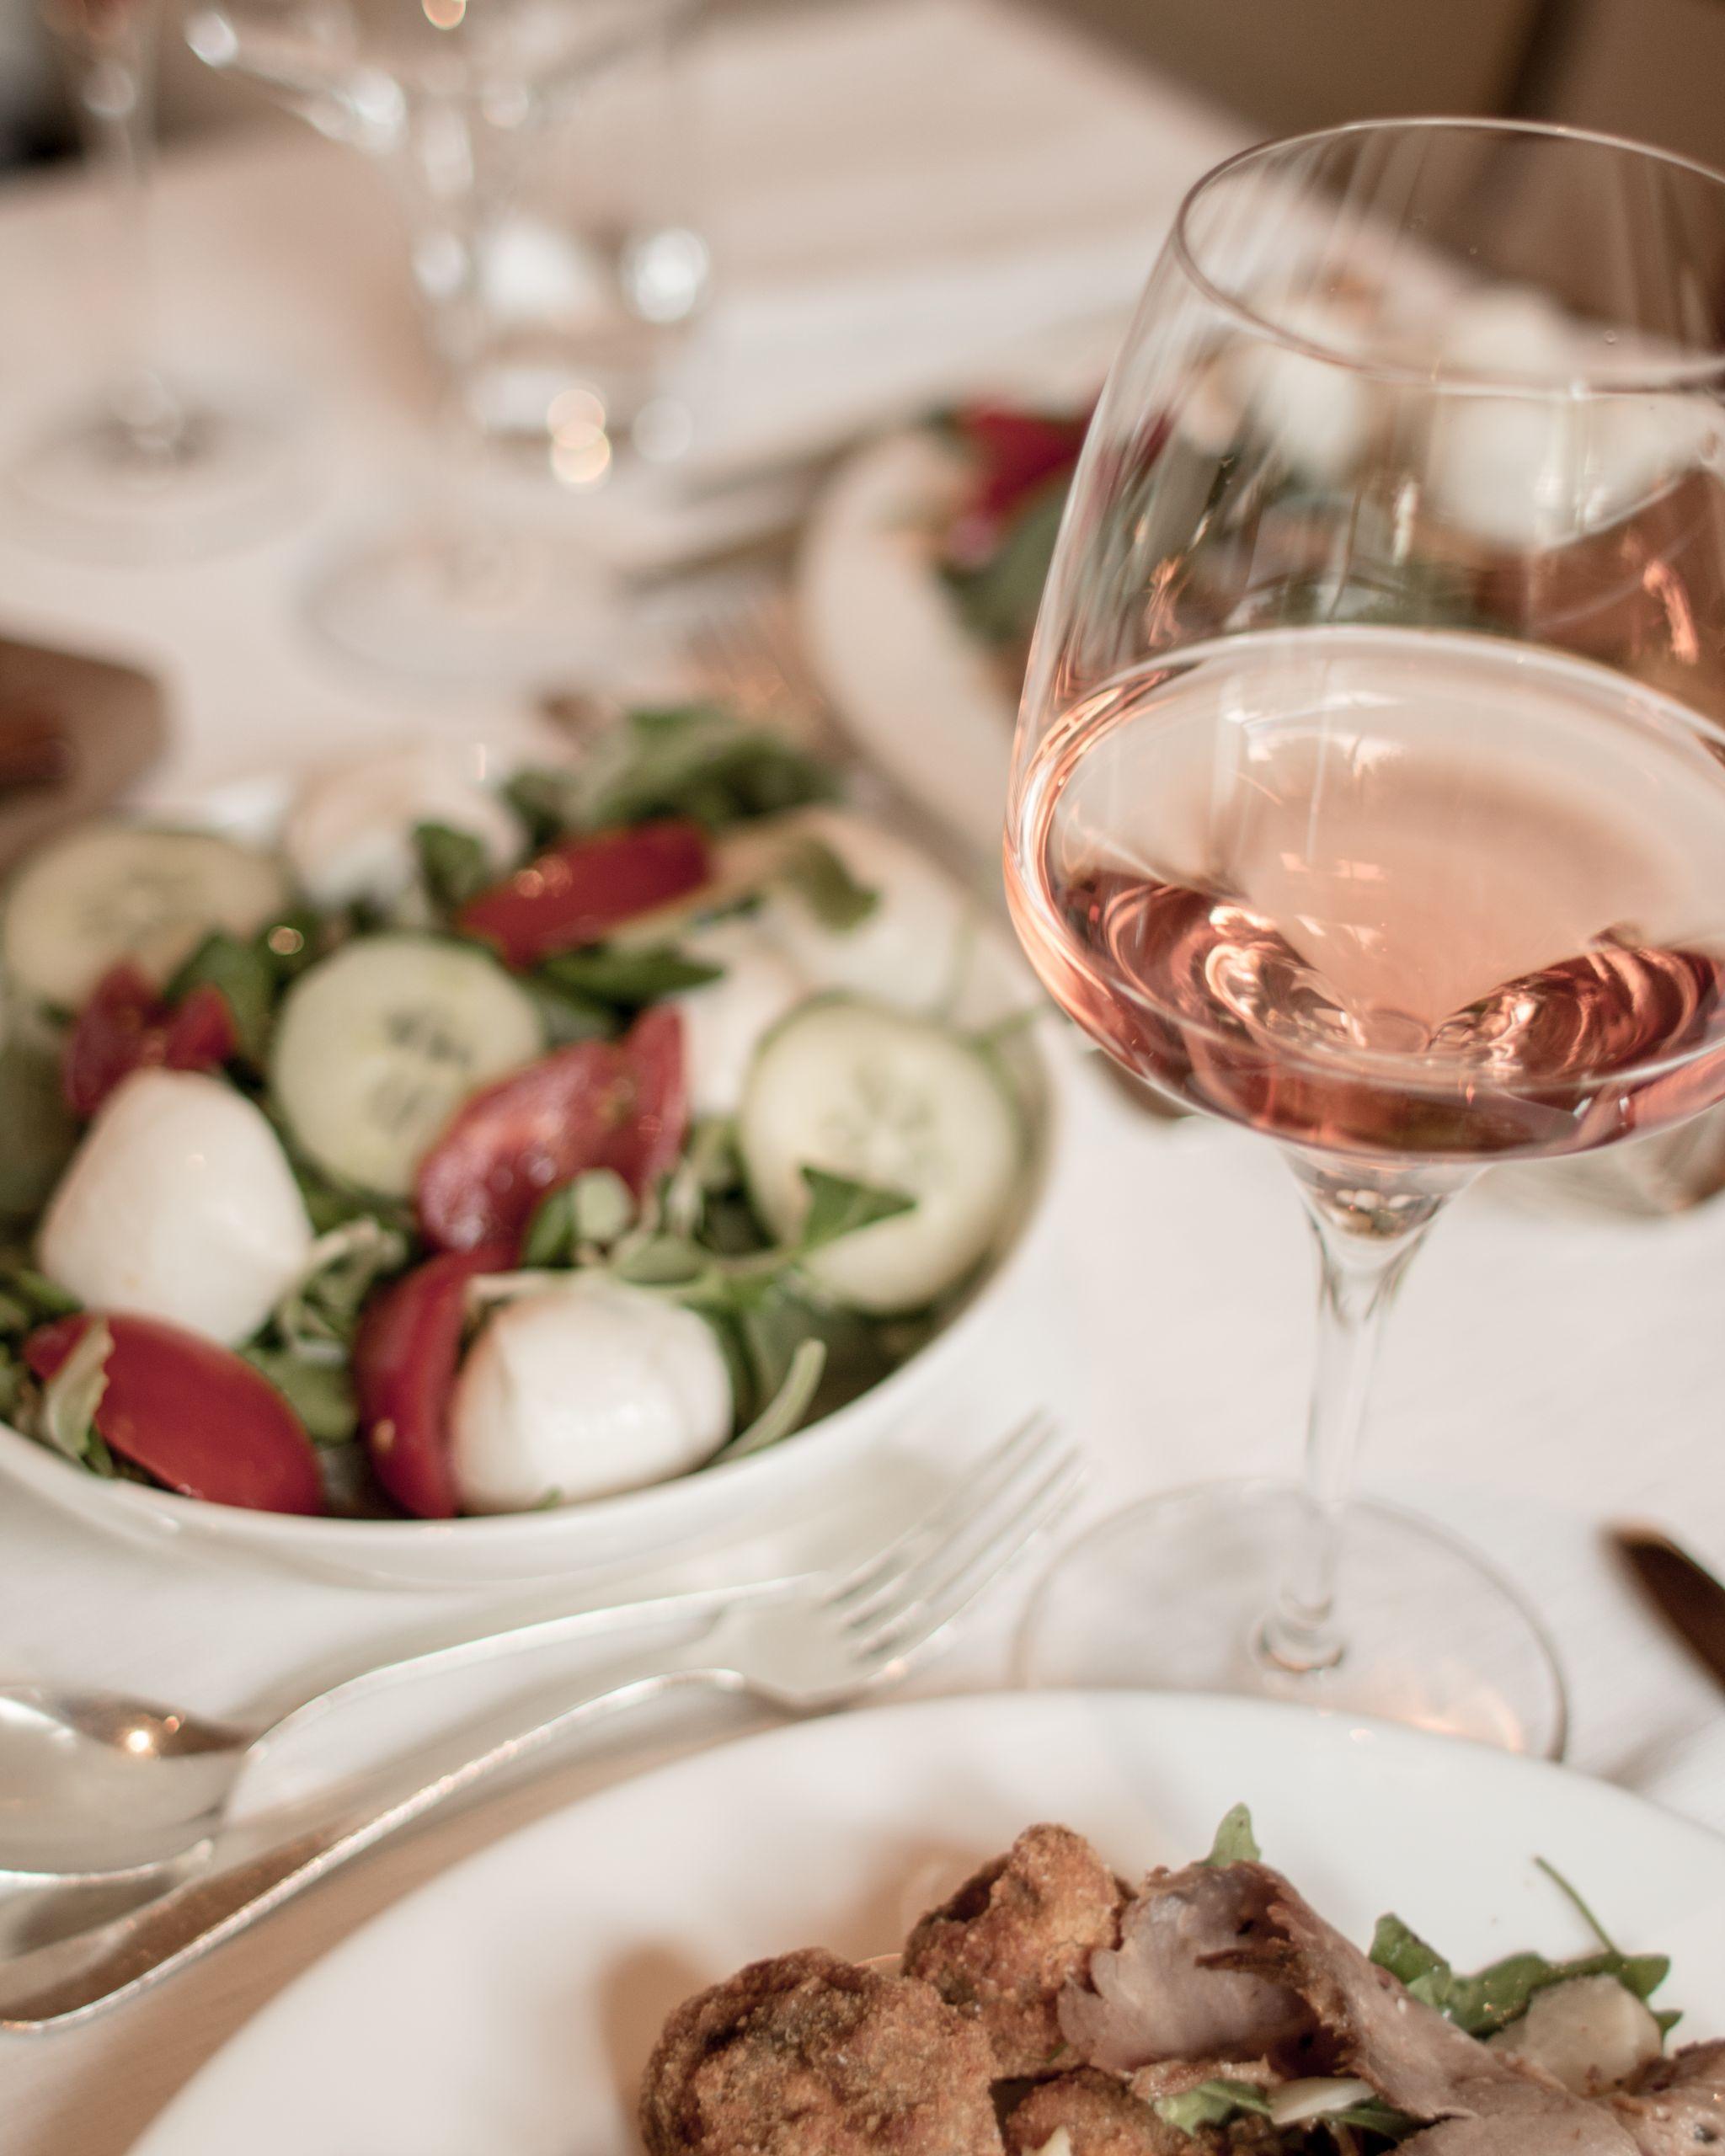 Adler Dolomites Hotel Ortisei Italy Hotel Hospitality Brand Photography Evening Meal Italian Rose